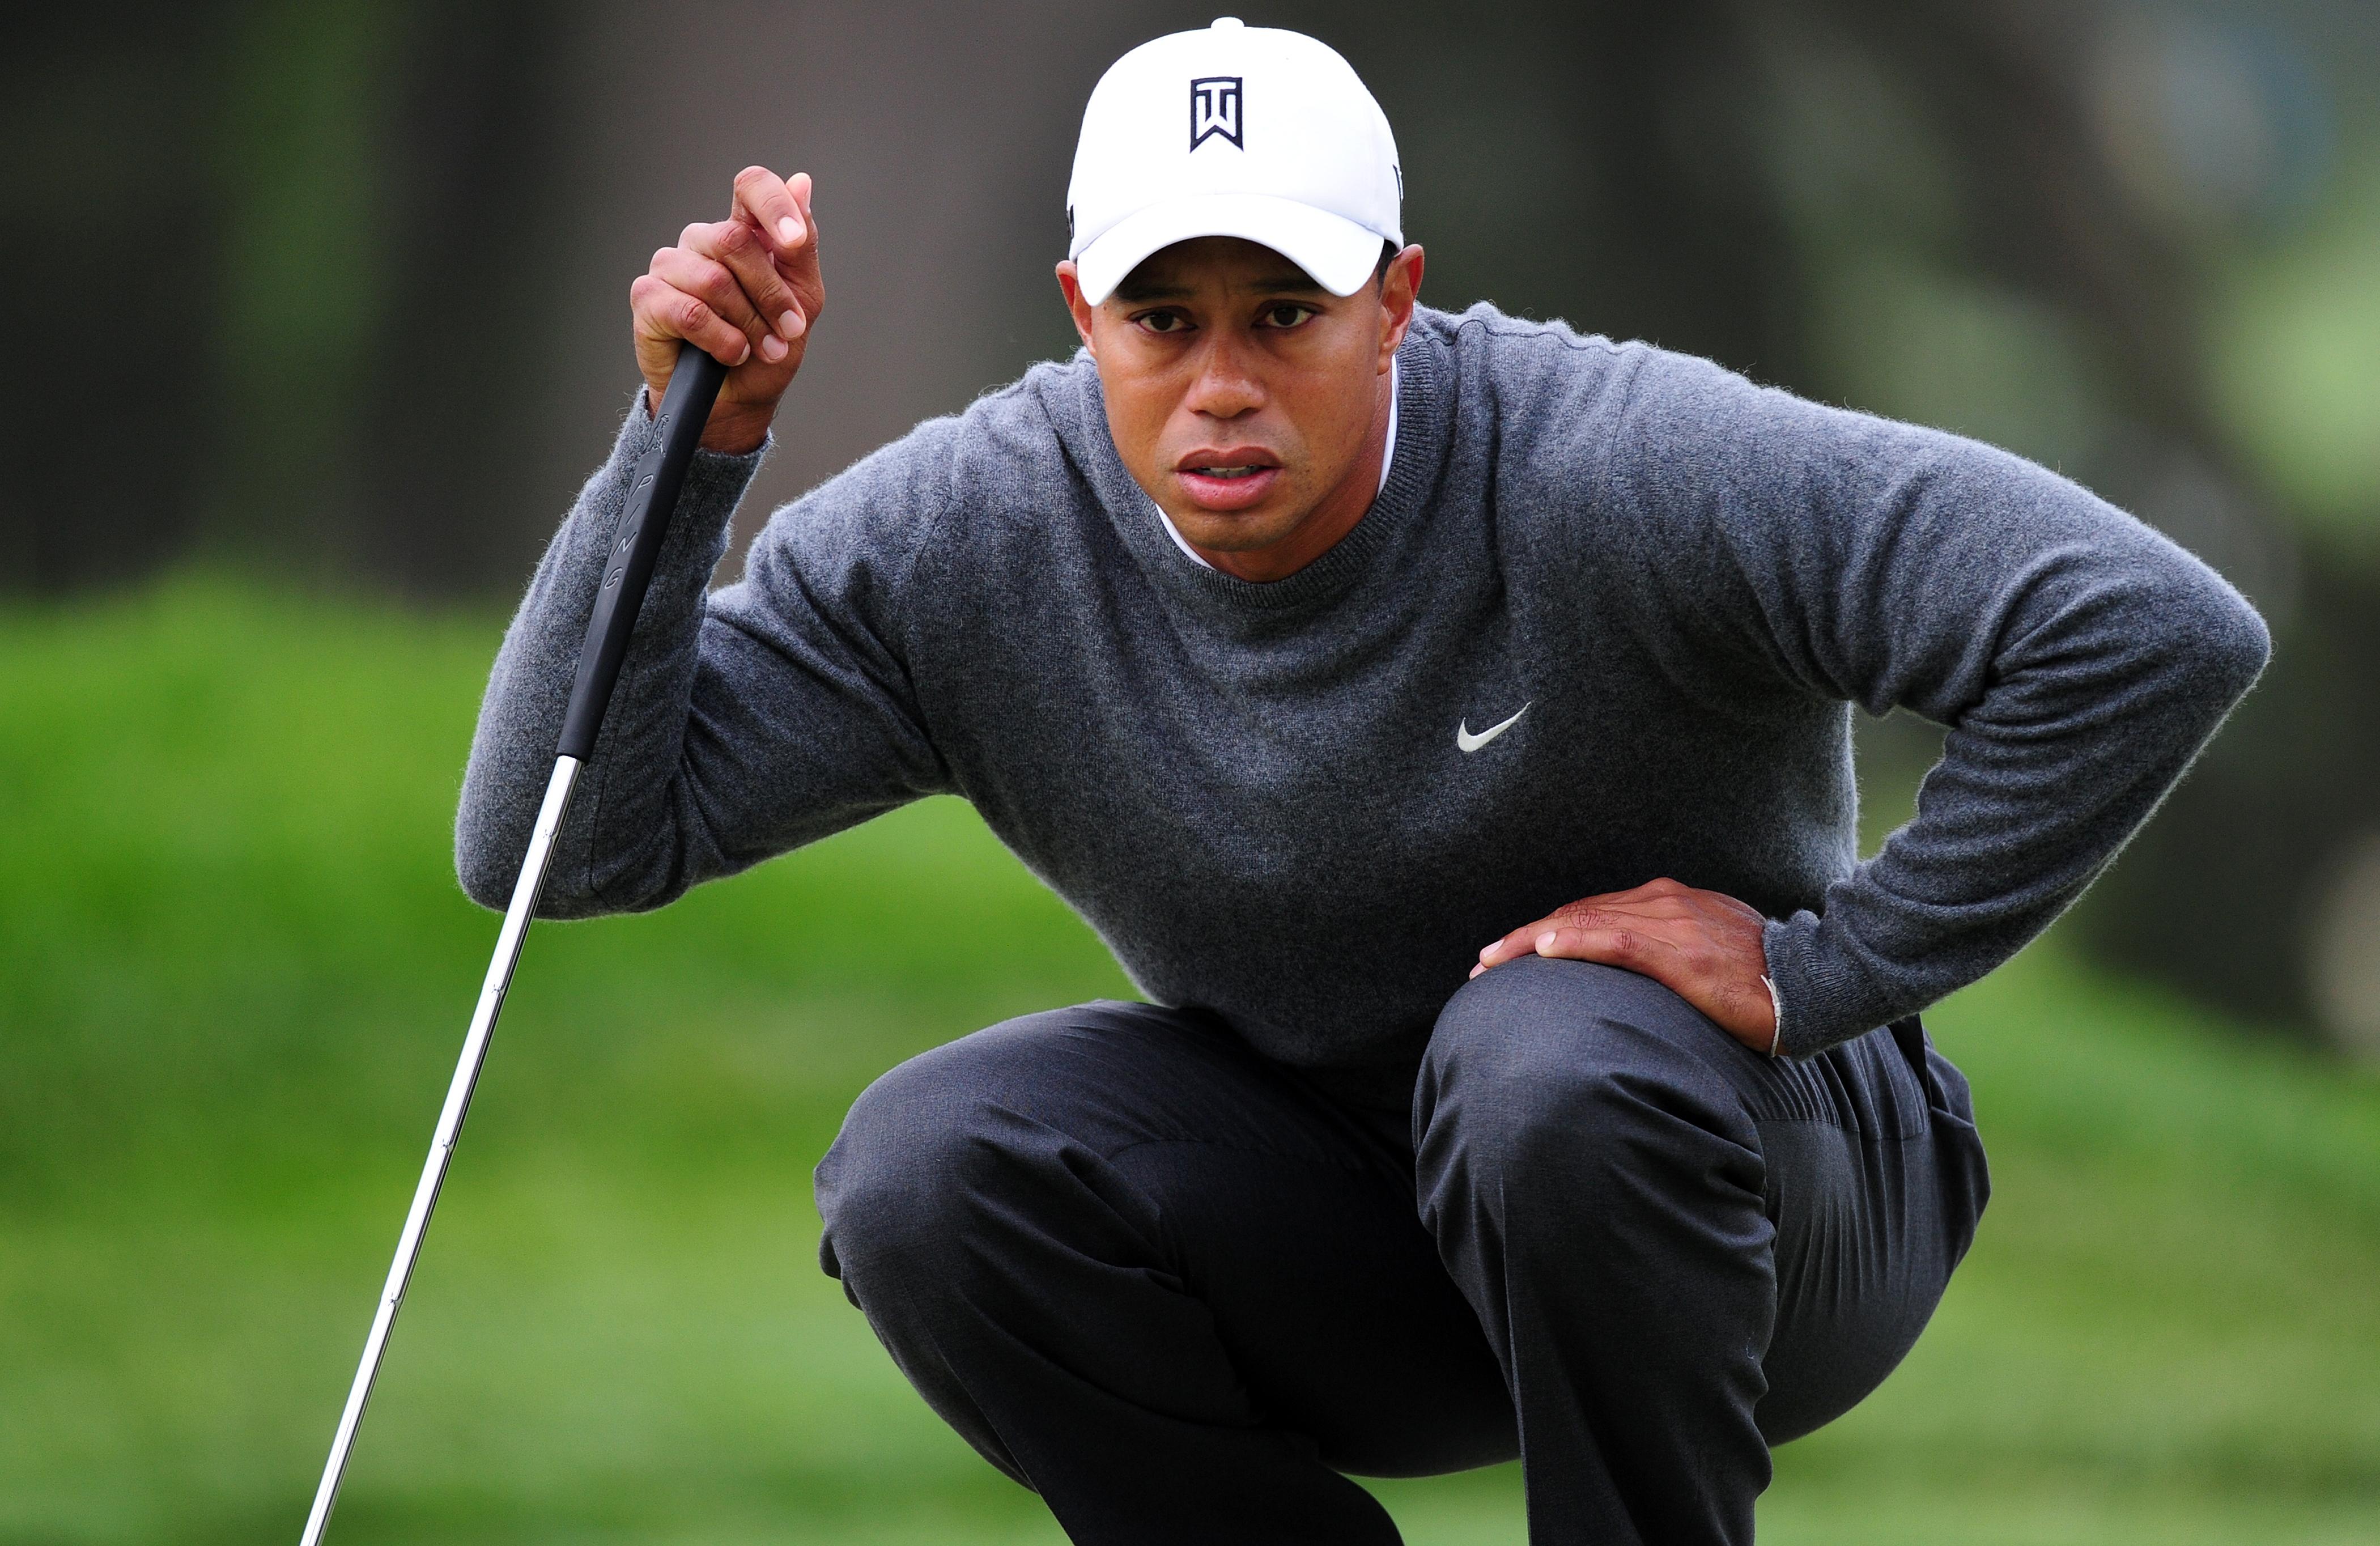 US Open 2012 - Tiger Woods